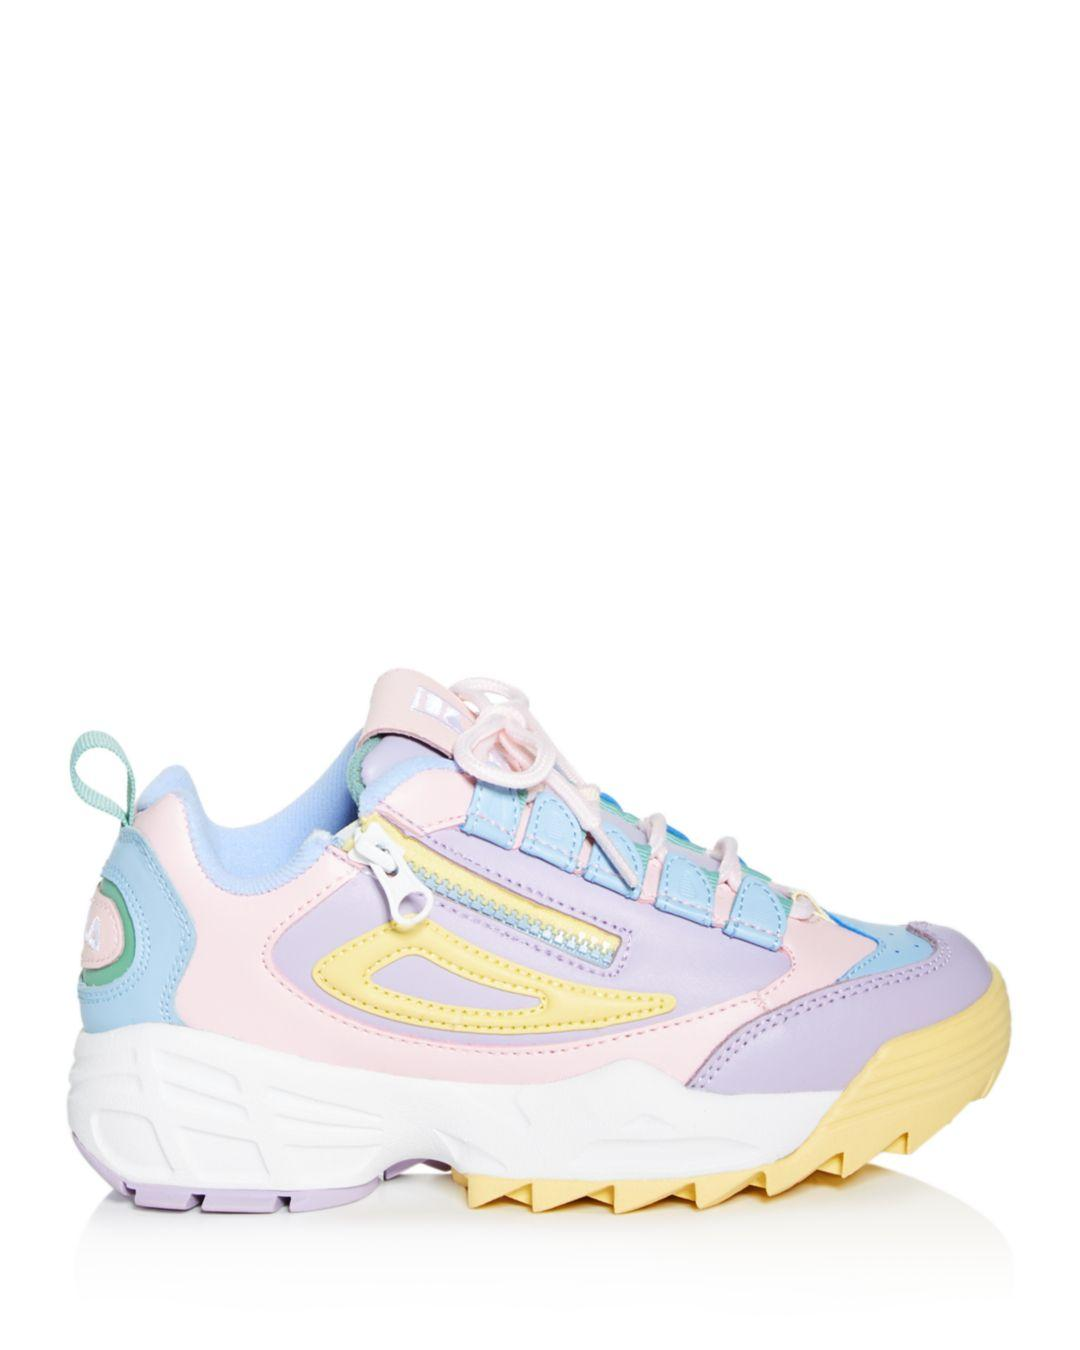 17cab7eba2b5 Fila Women s Disruptor 3 Zip Low-top Sneakers - Lyst